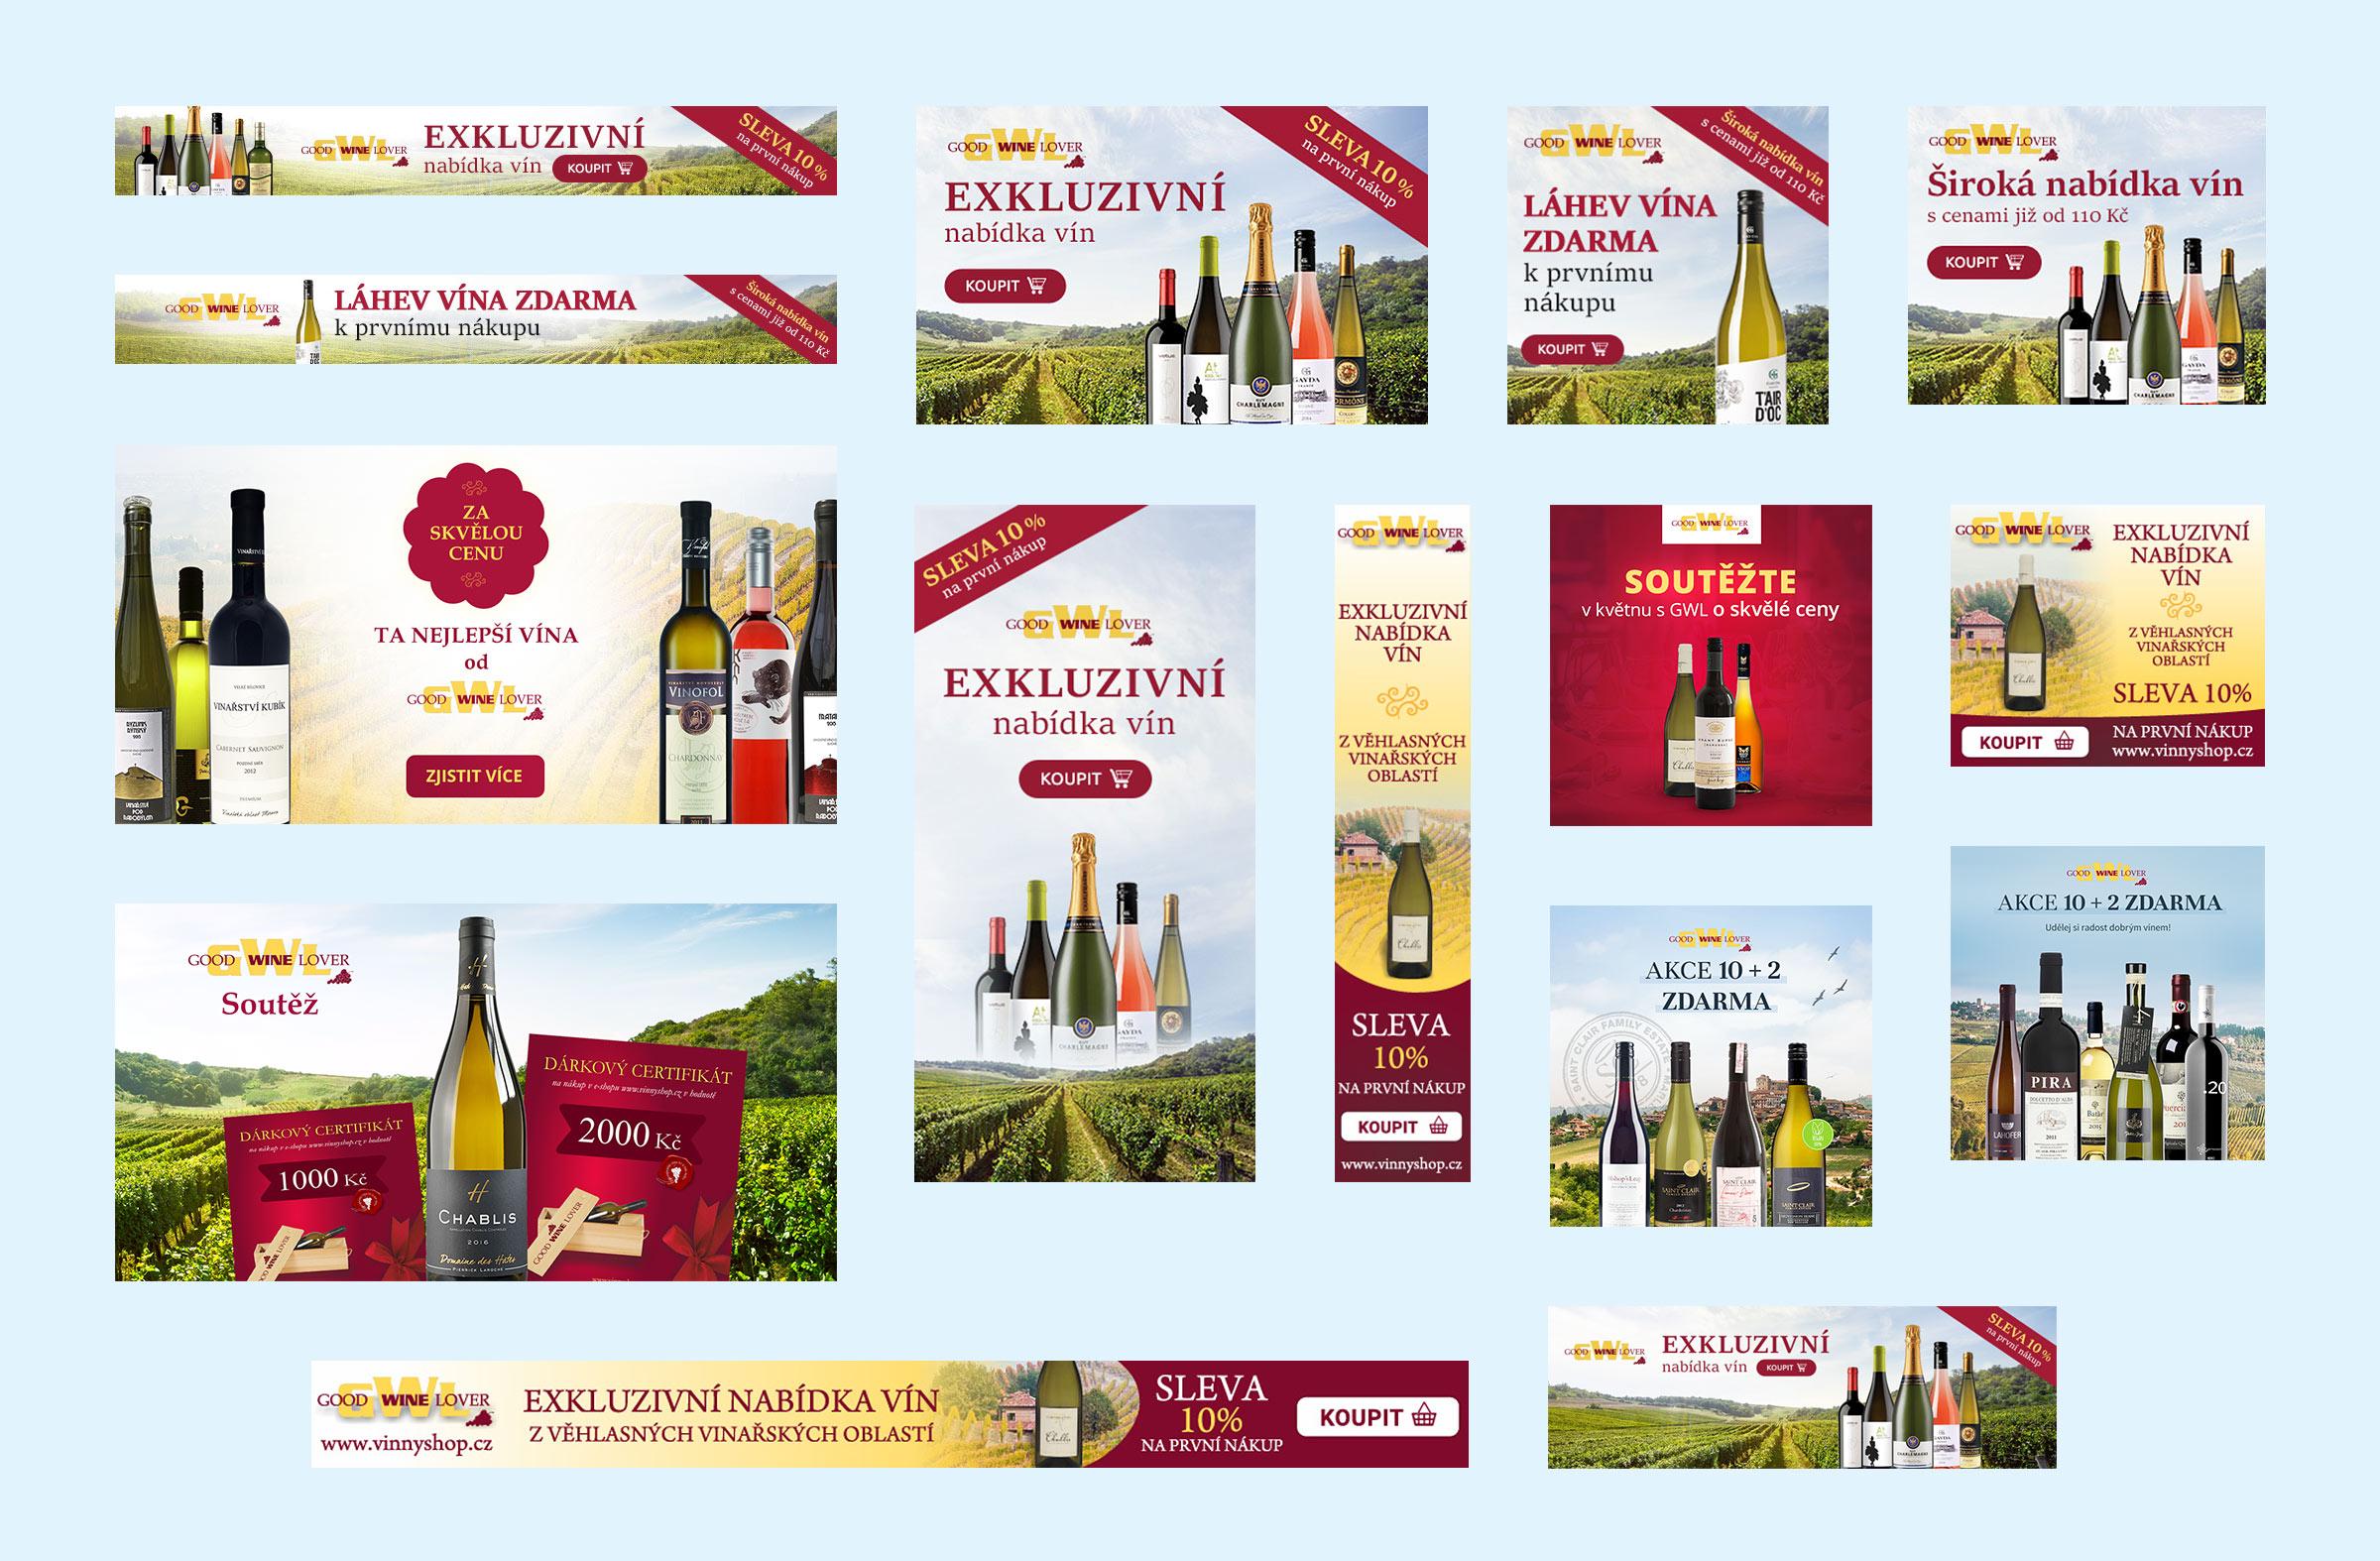 GWL Vinný shop - bannerová reklama